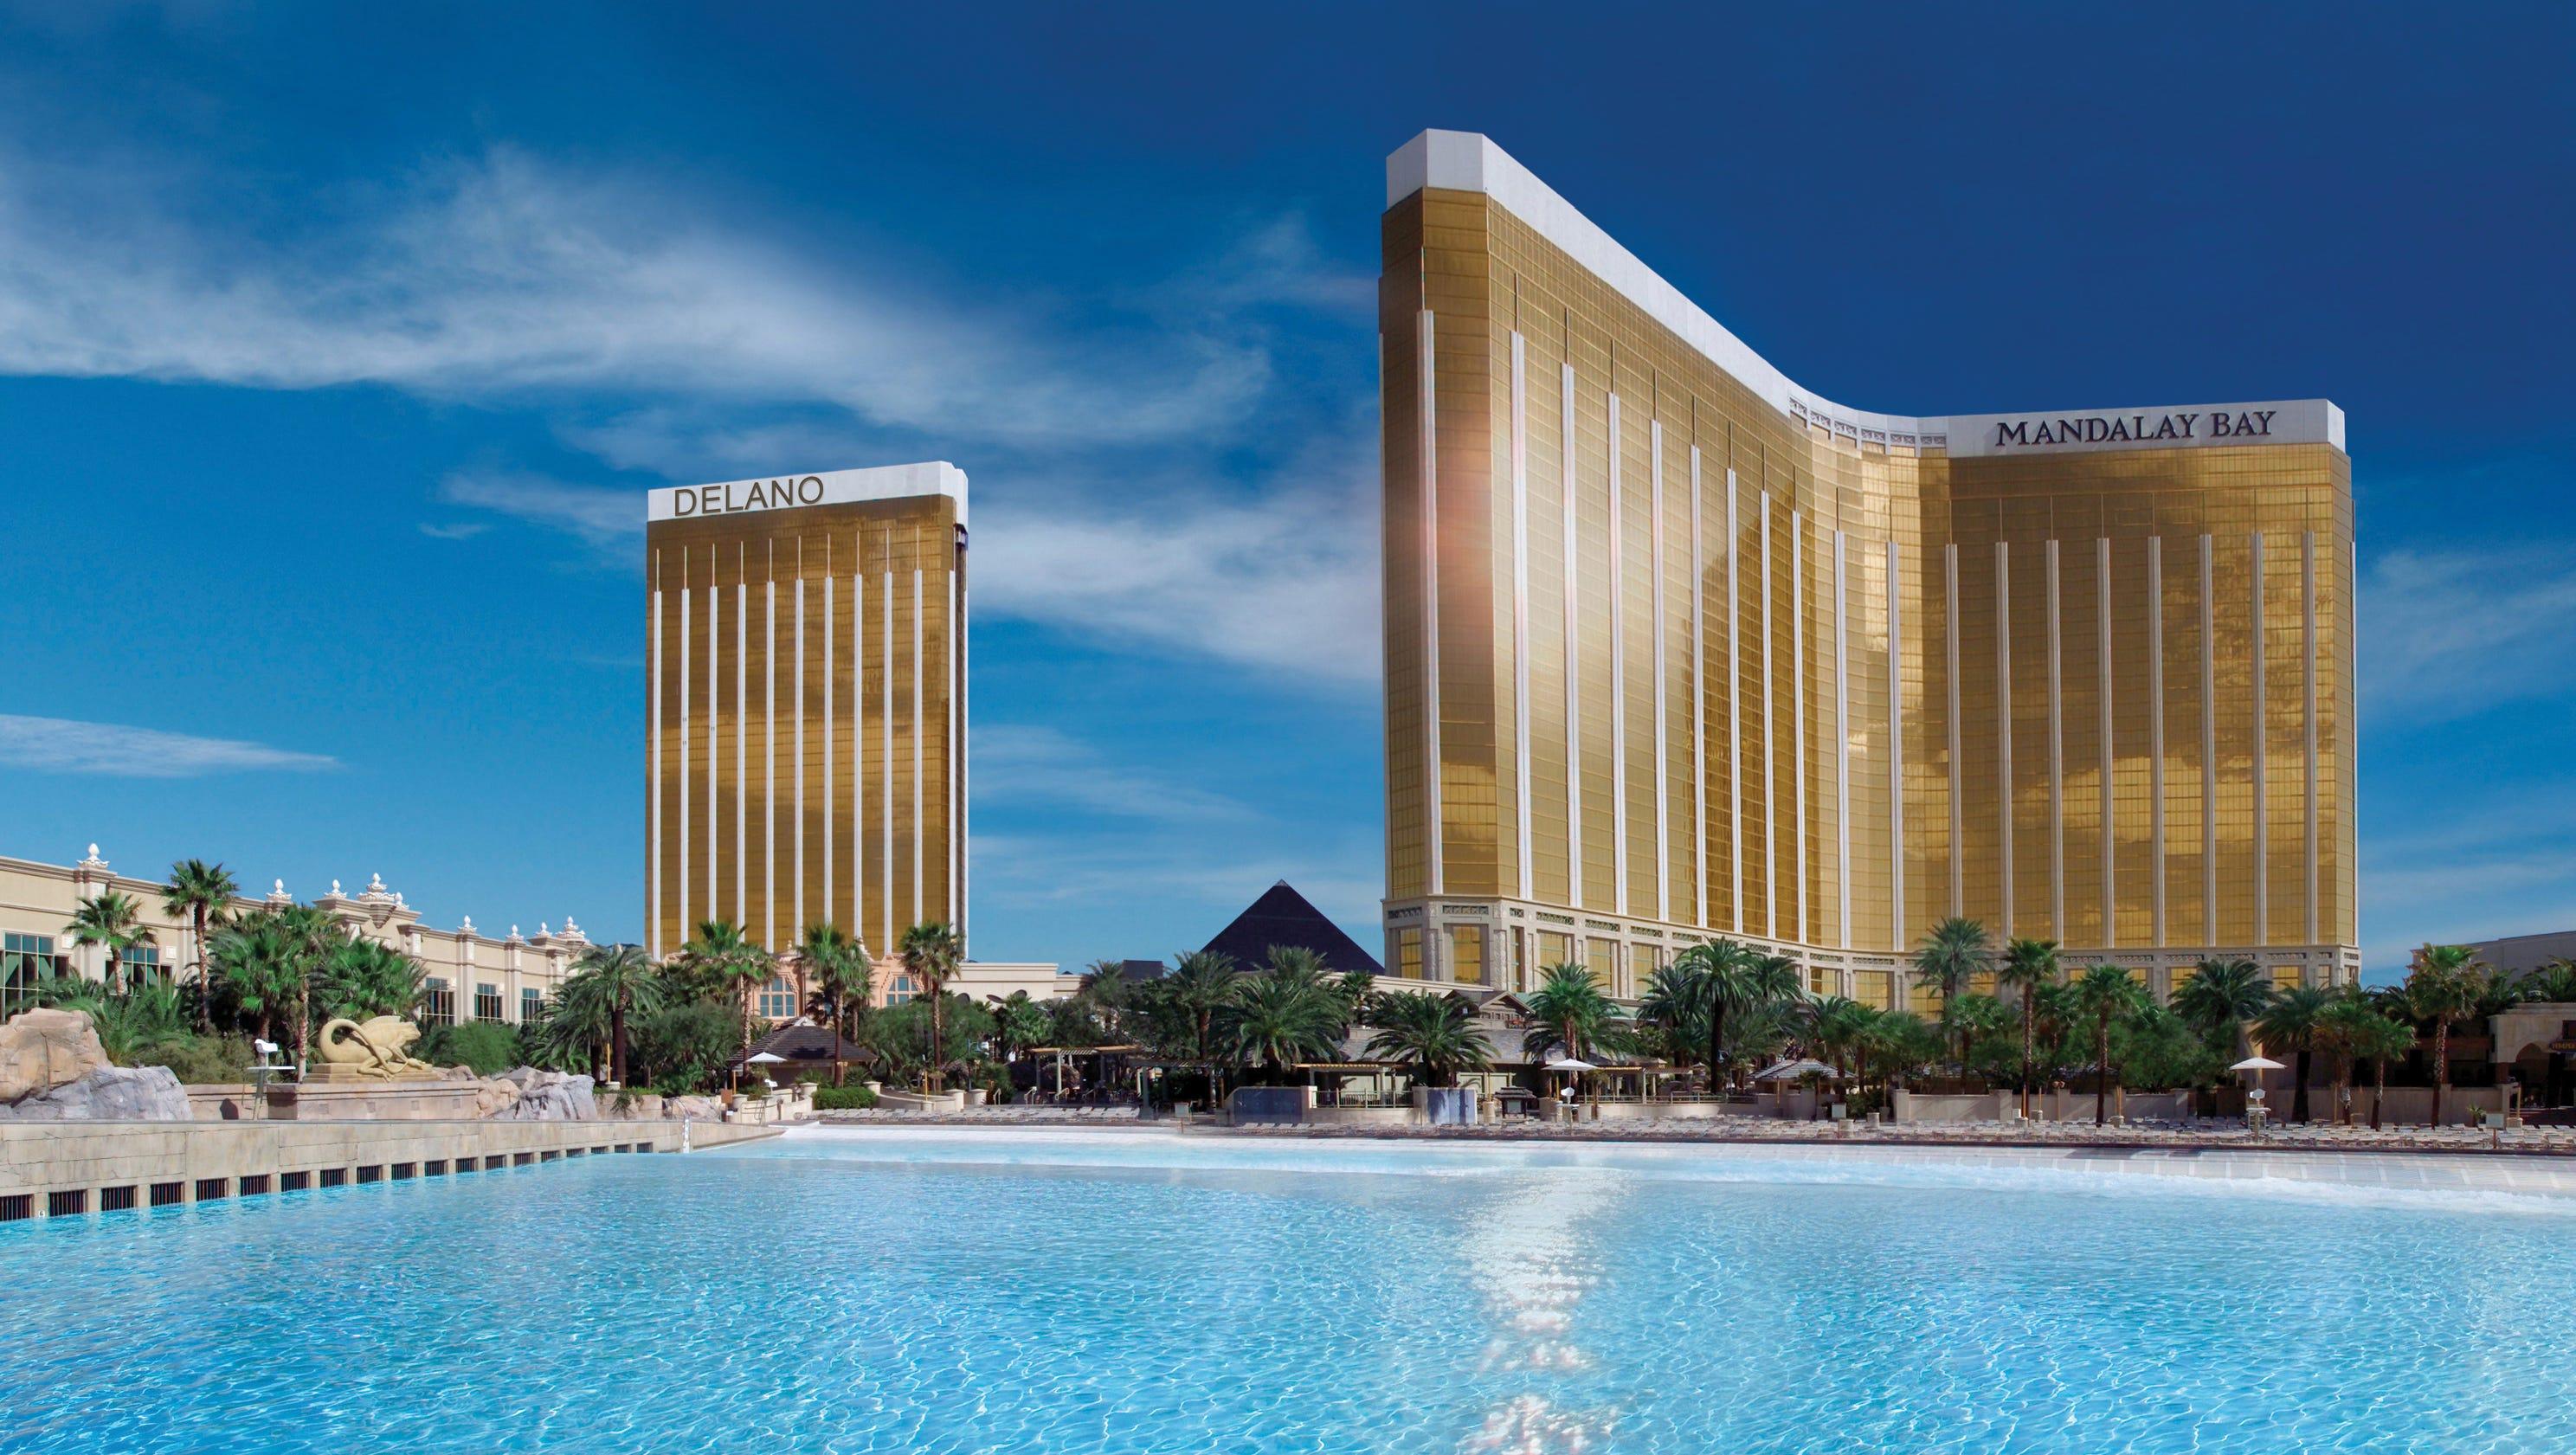 MANDALAY BAY Room KEY Card LAS VEGAS Casino Hotel /& Delano PROPERTY VIEW ~